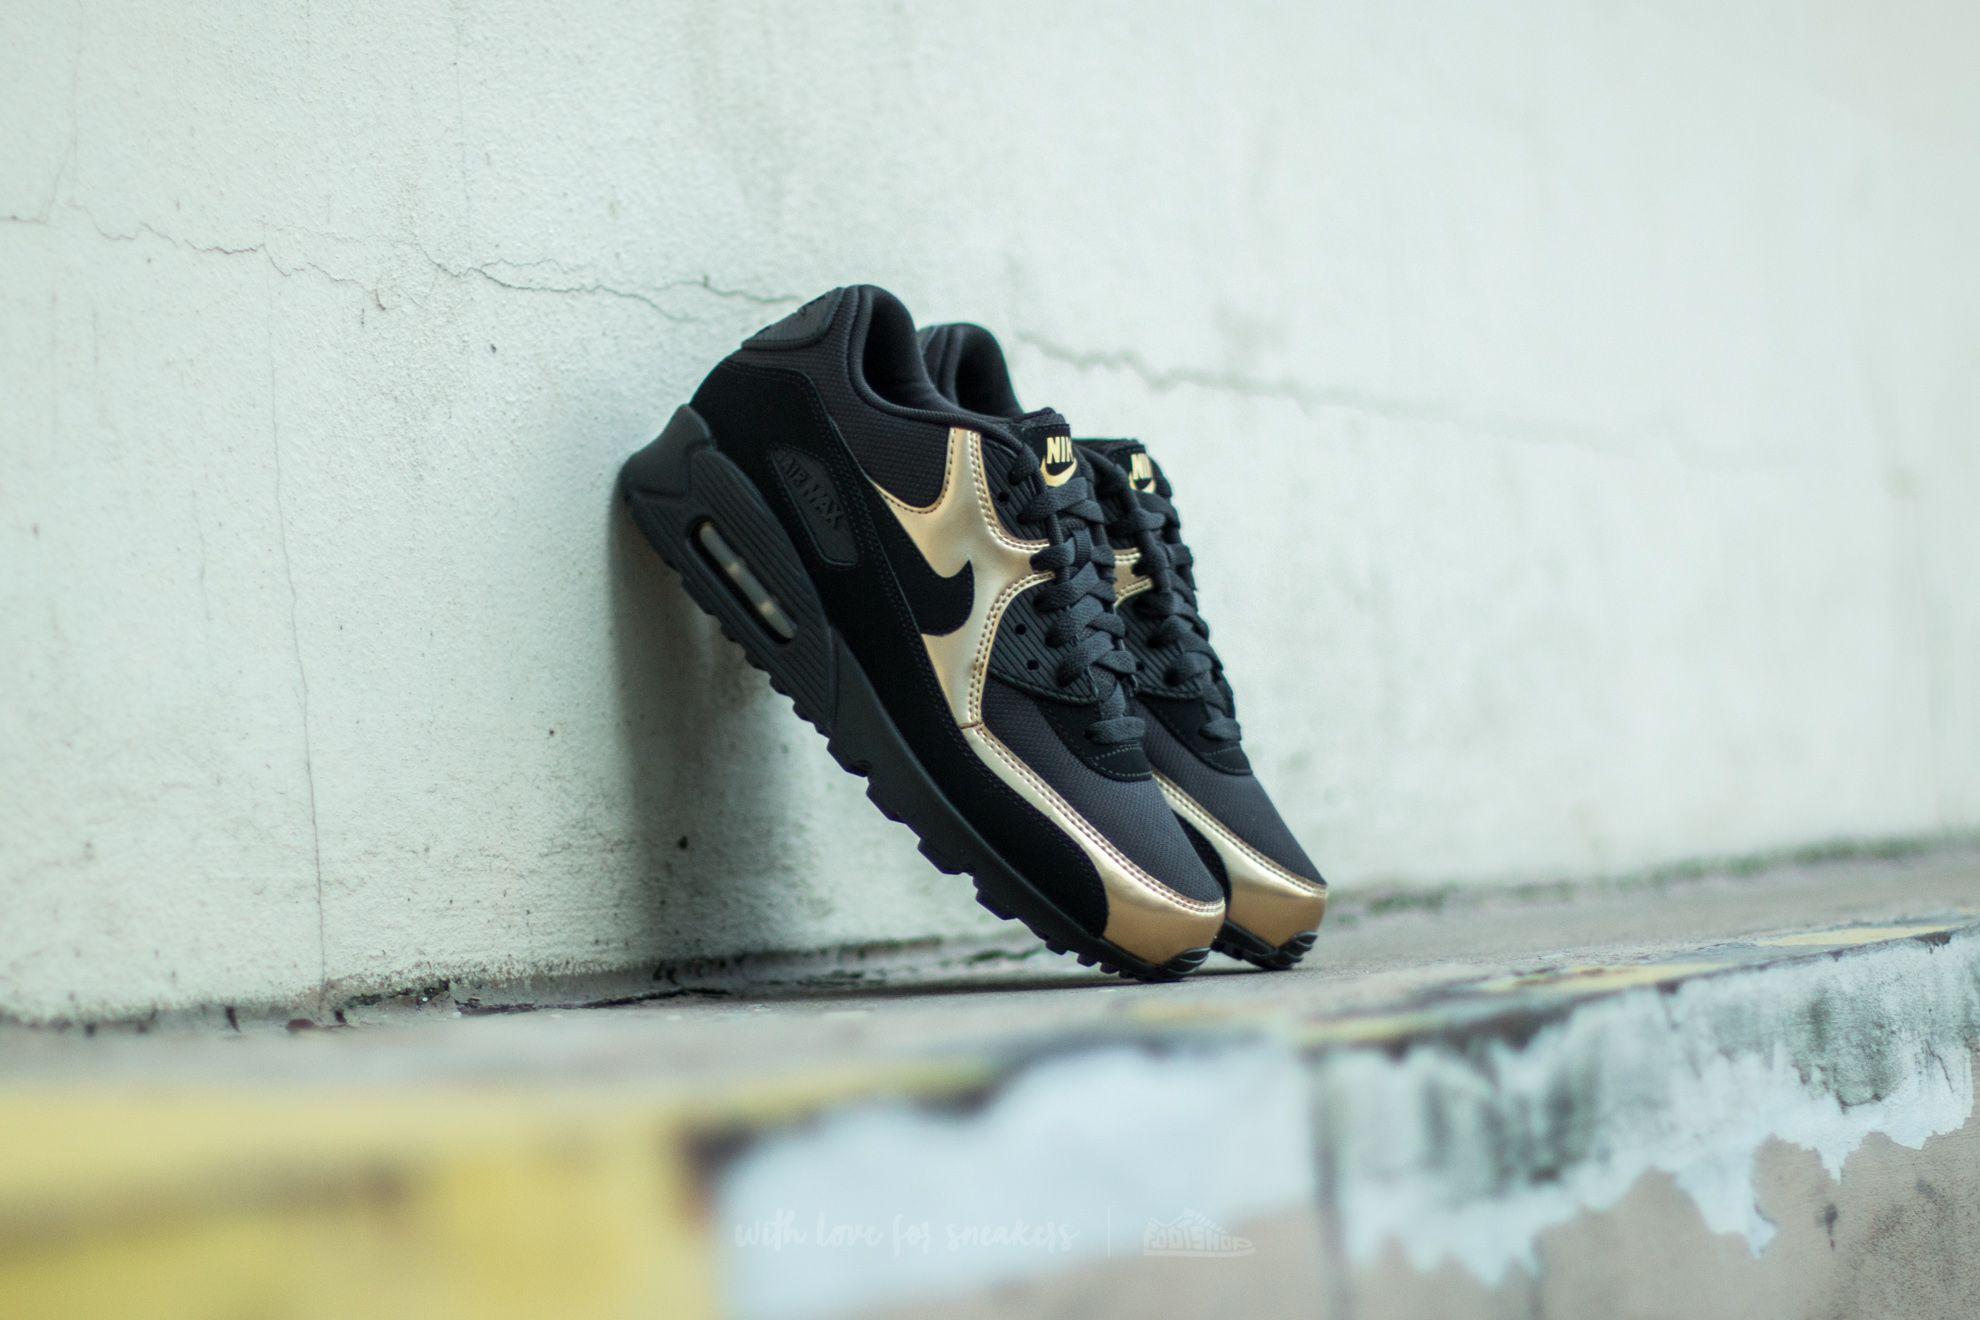 cheaper e6c94 55554 Nike Air Max 90 Essential. Black  Black-Metallic Gold